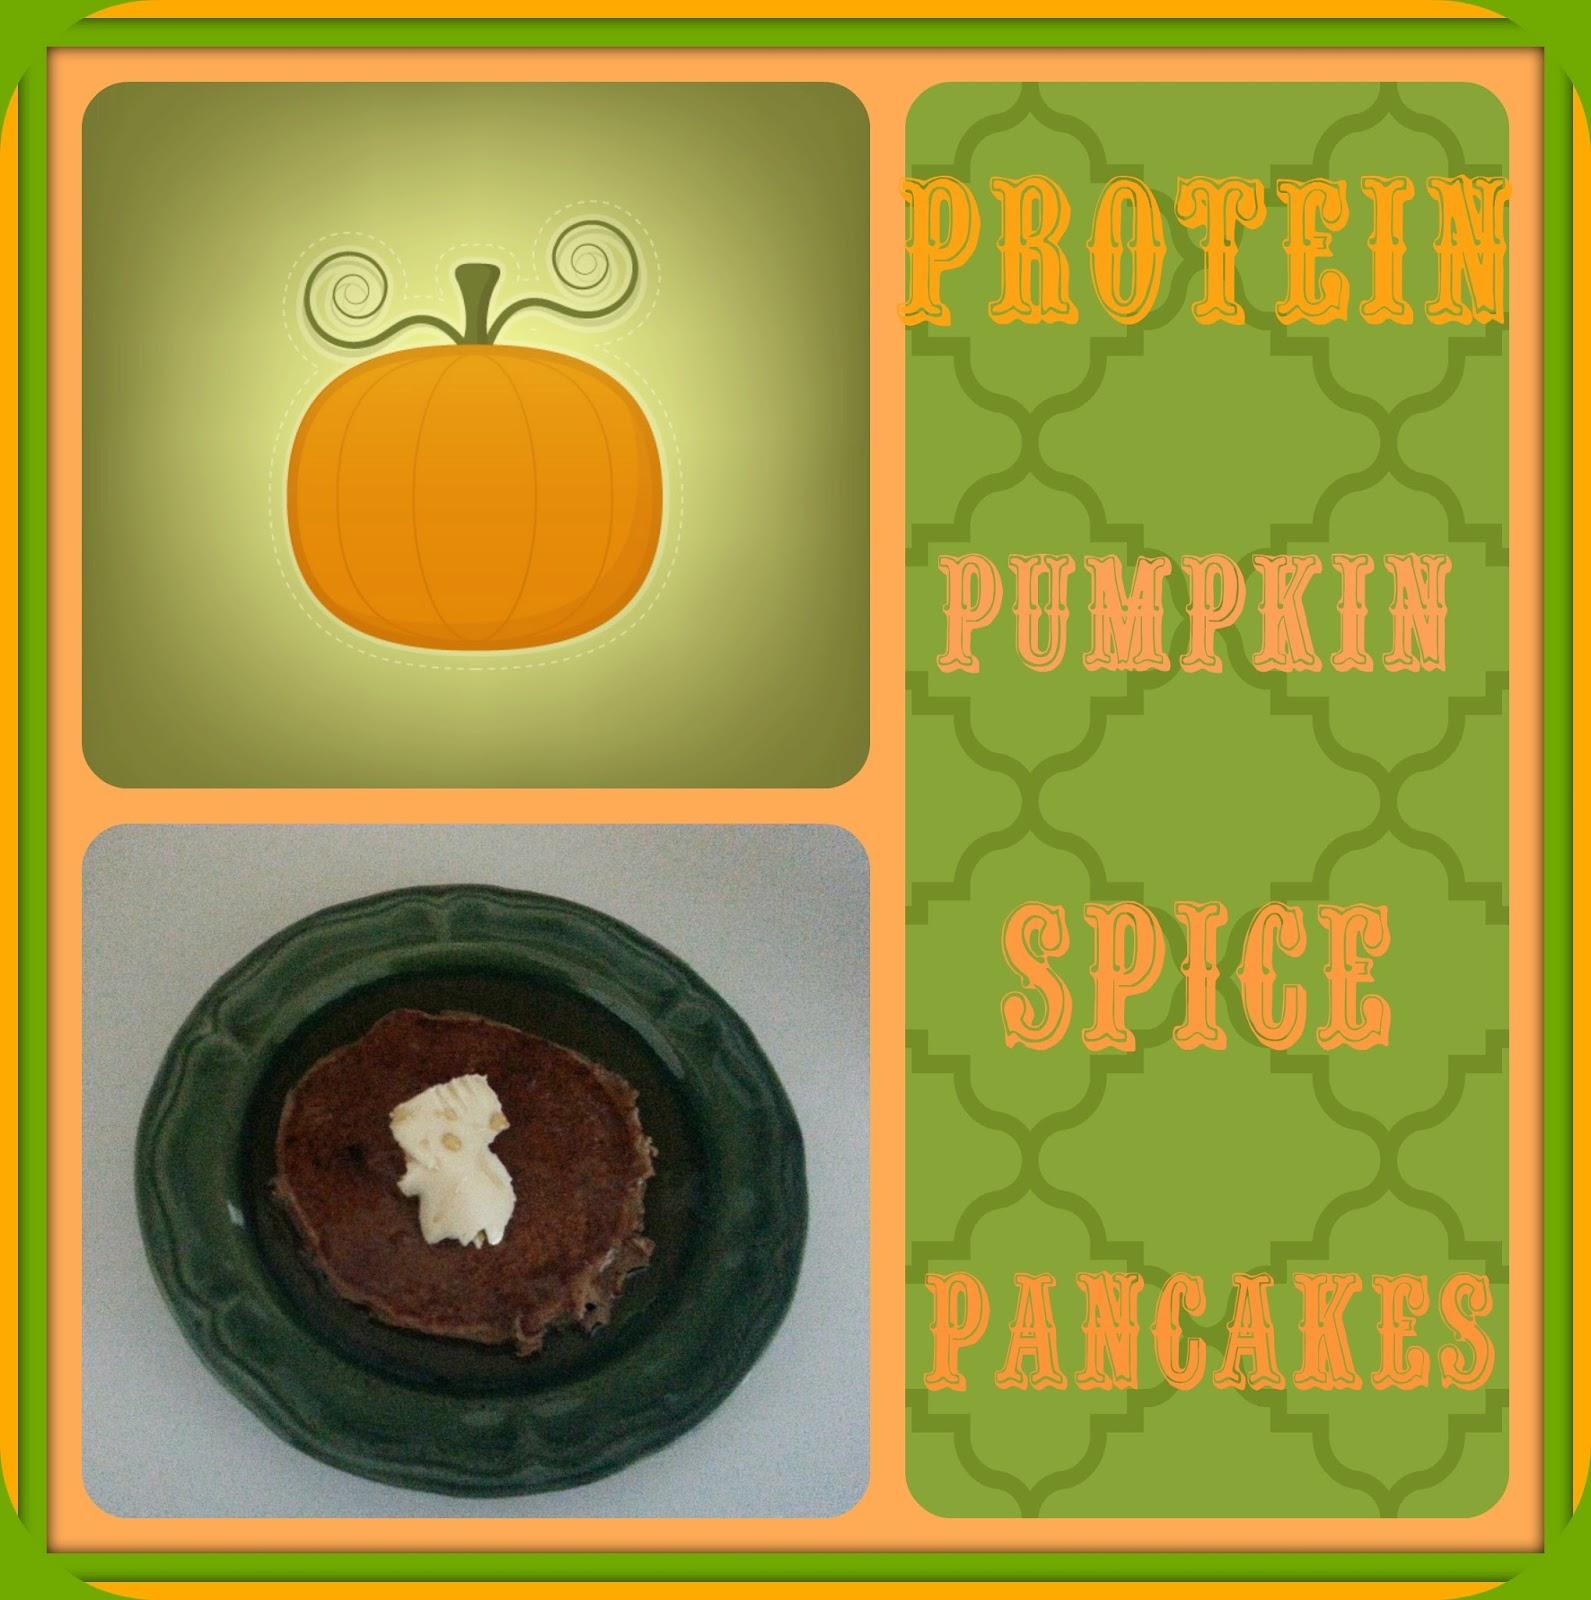 Pati's way thru life: Protein Pumpkin Spice Pancakes